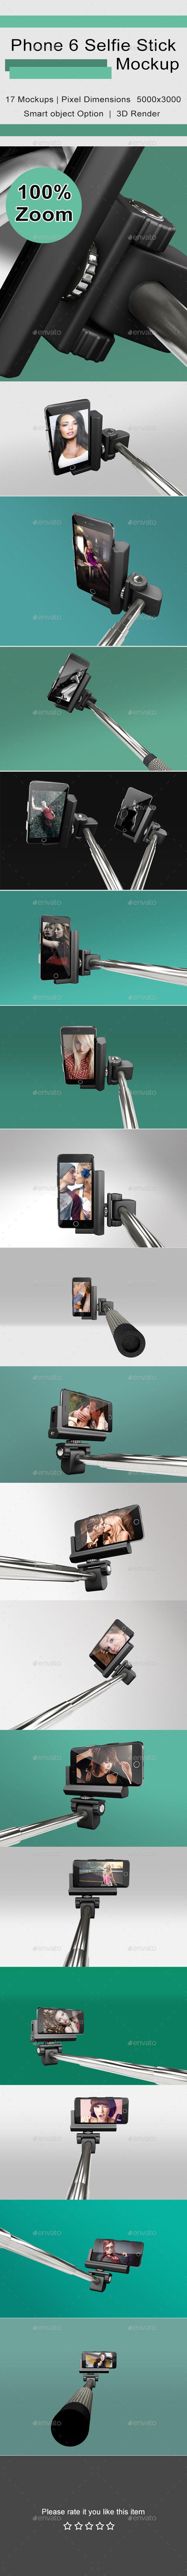 Phone 6 Selfie Stick Mockup - Mobile Displays